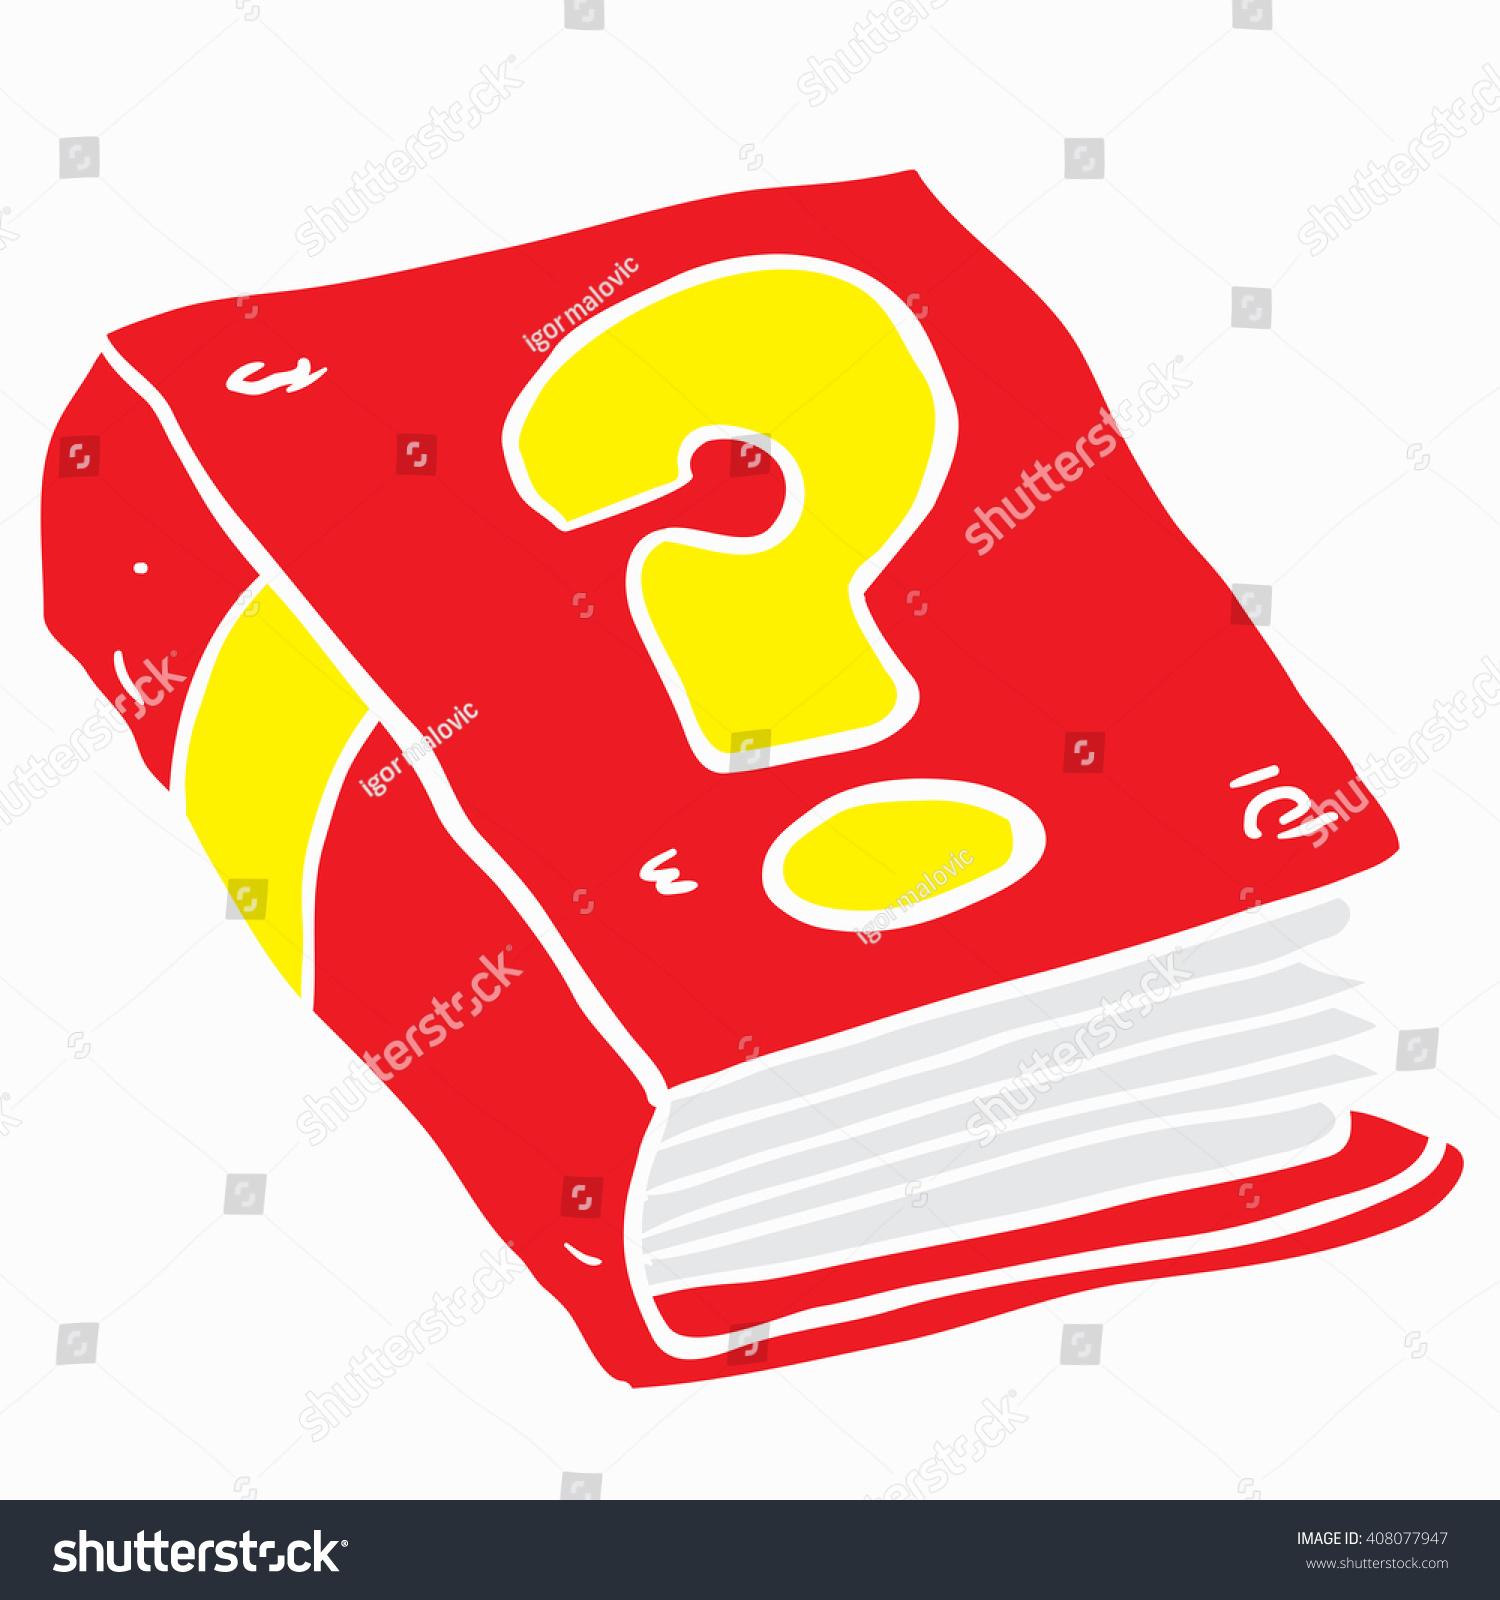 book question mark cartoon stock illustration 408077947 shutterstock